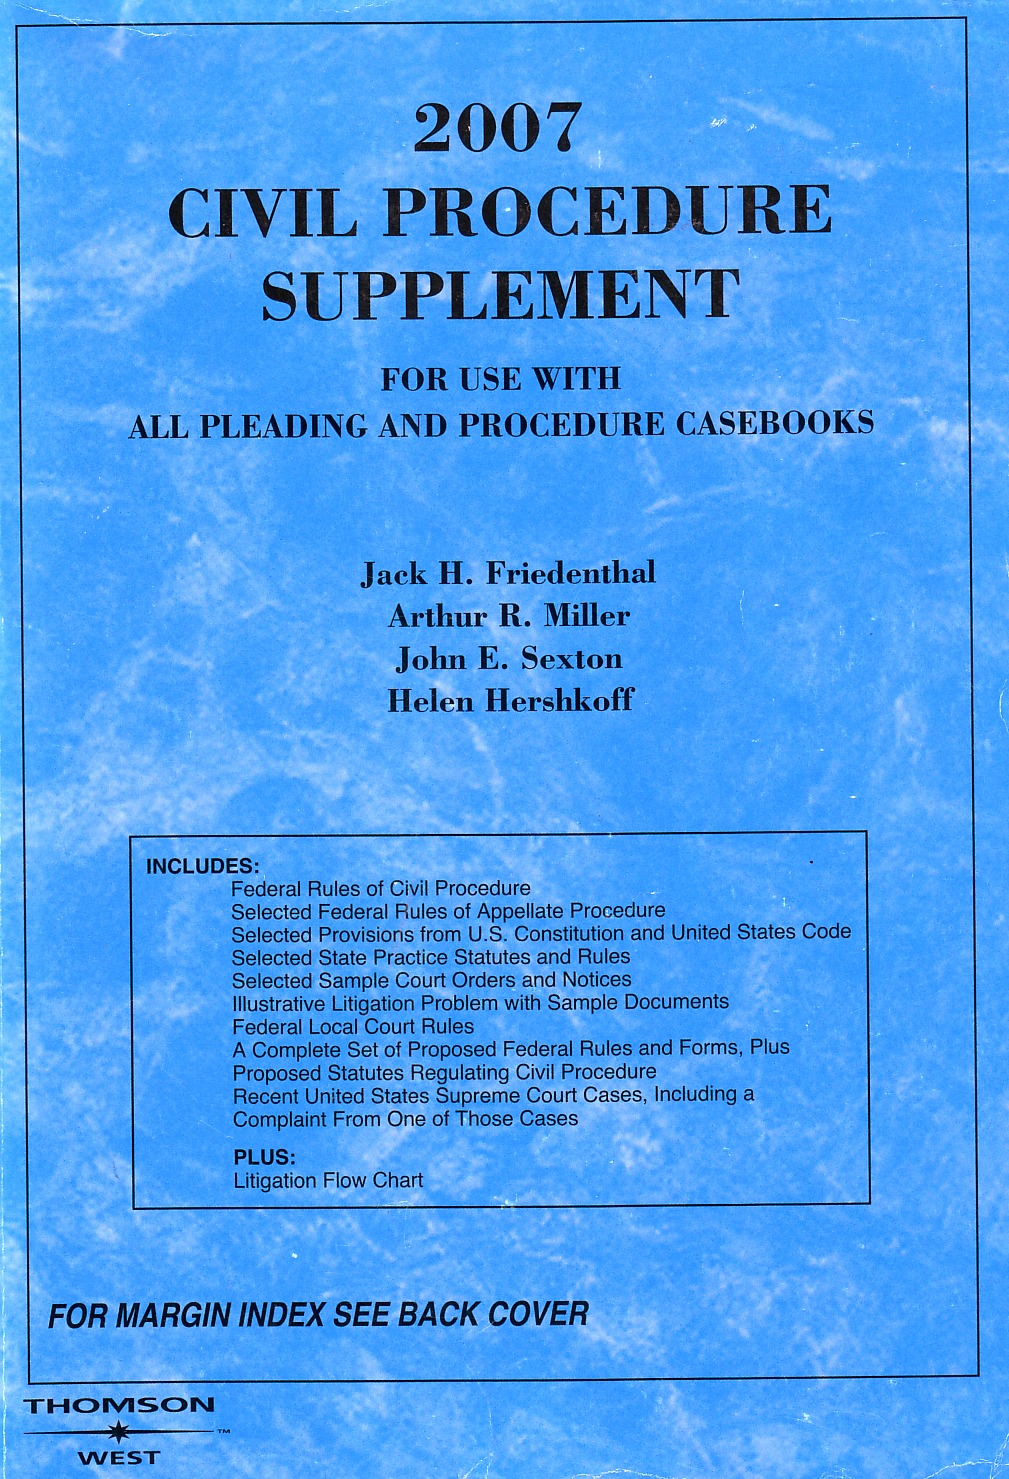 2007 Civil Procedure Supplement